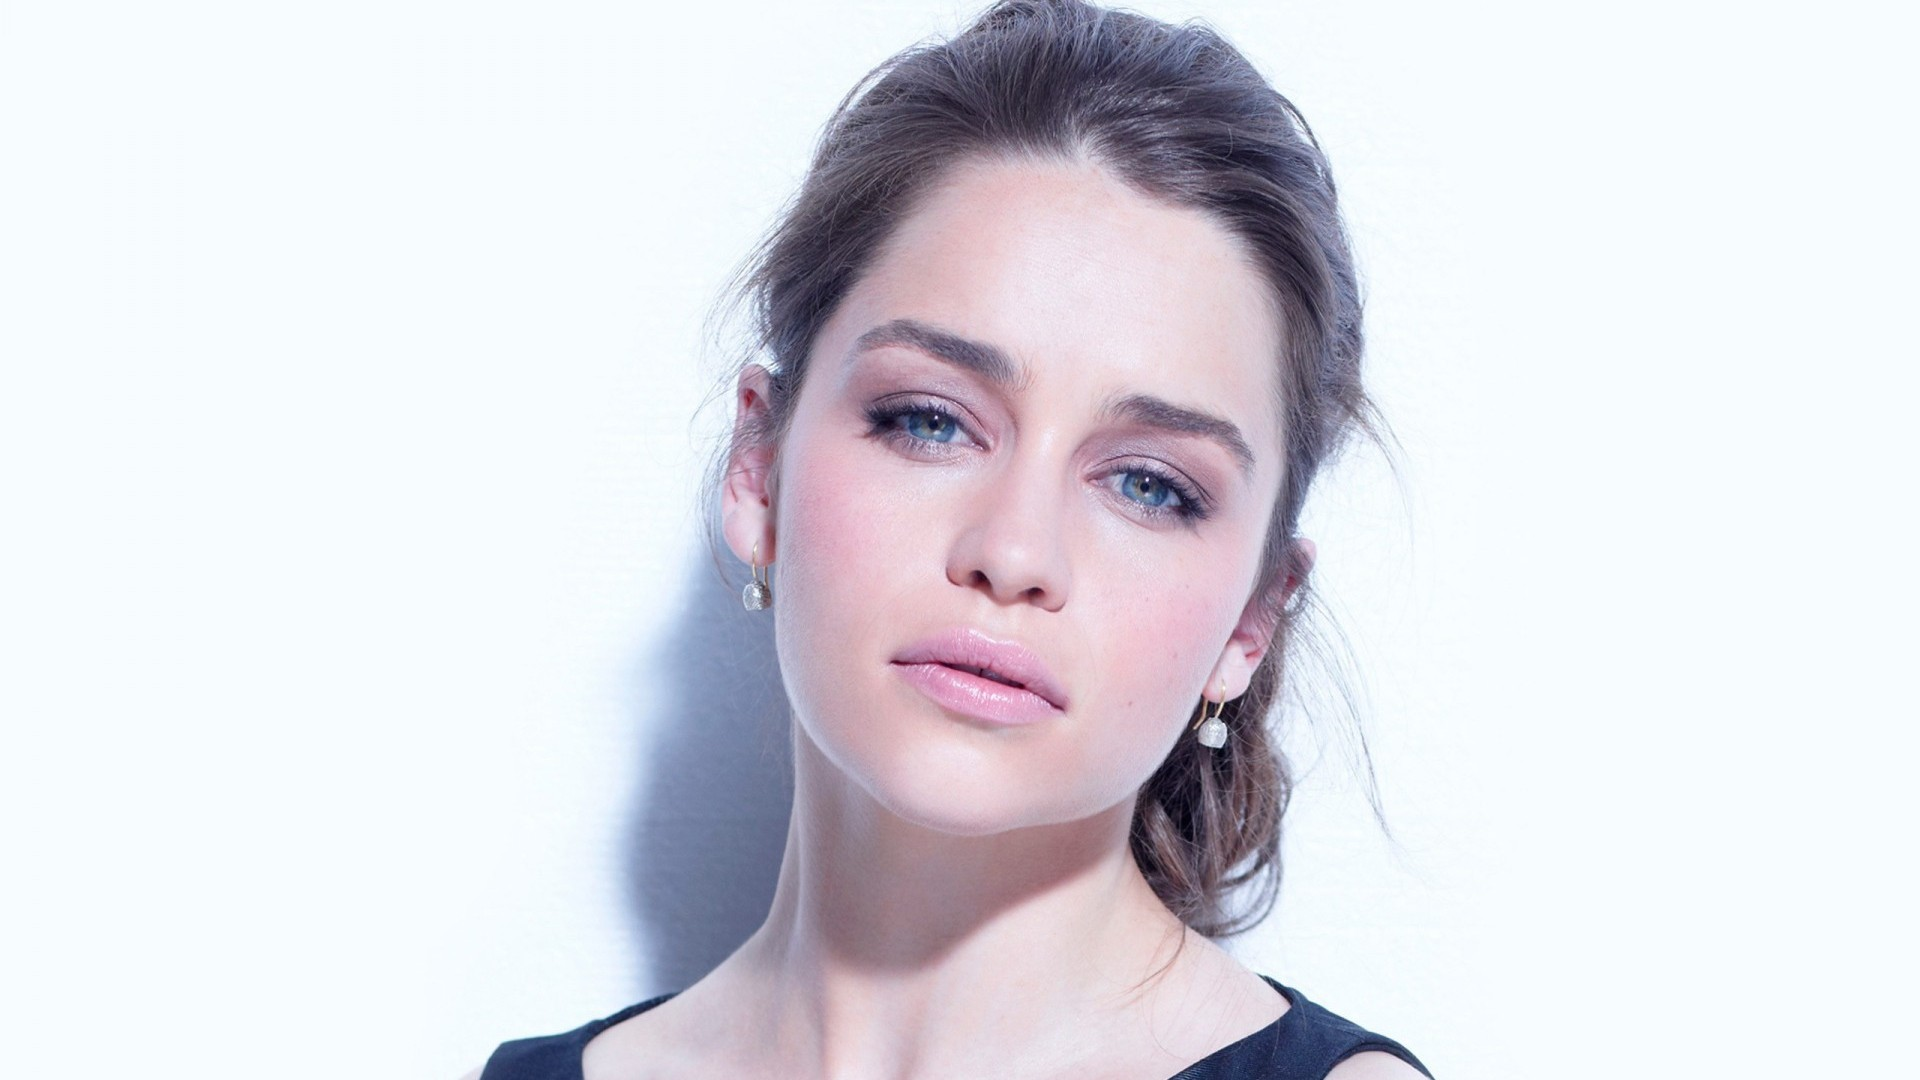 Nice Images Collection: Emilia Clarke Desktop Wallpapers